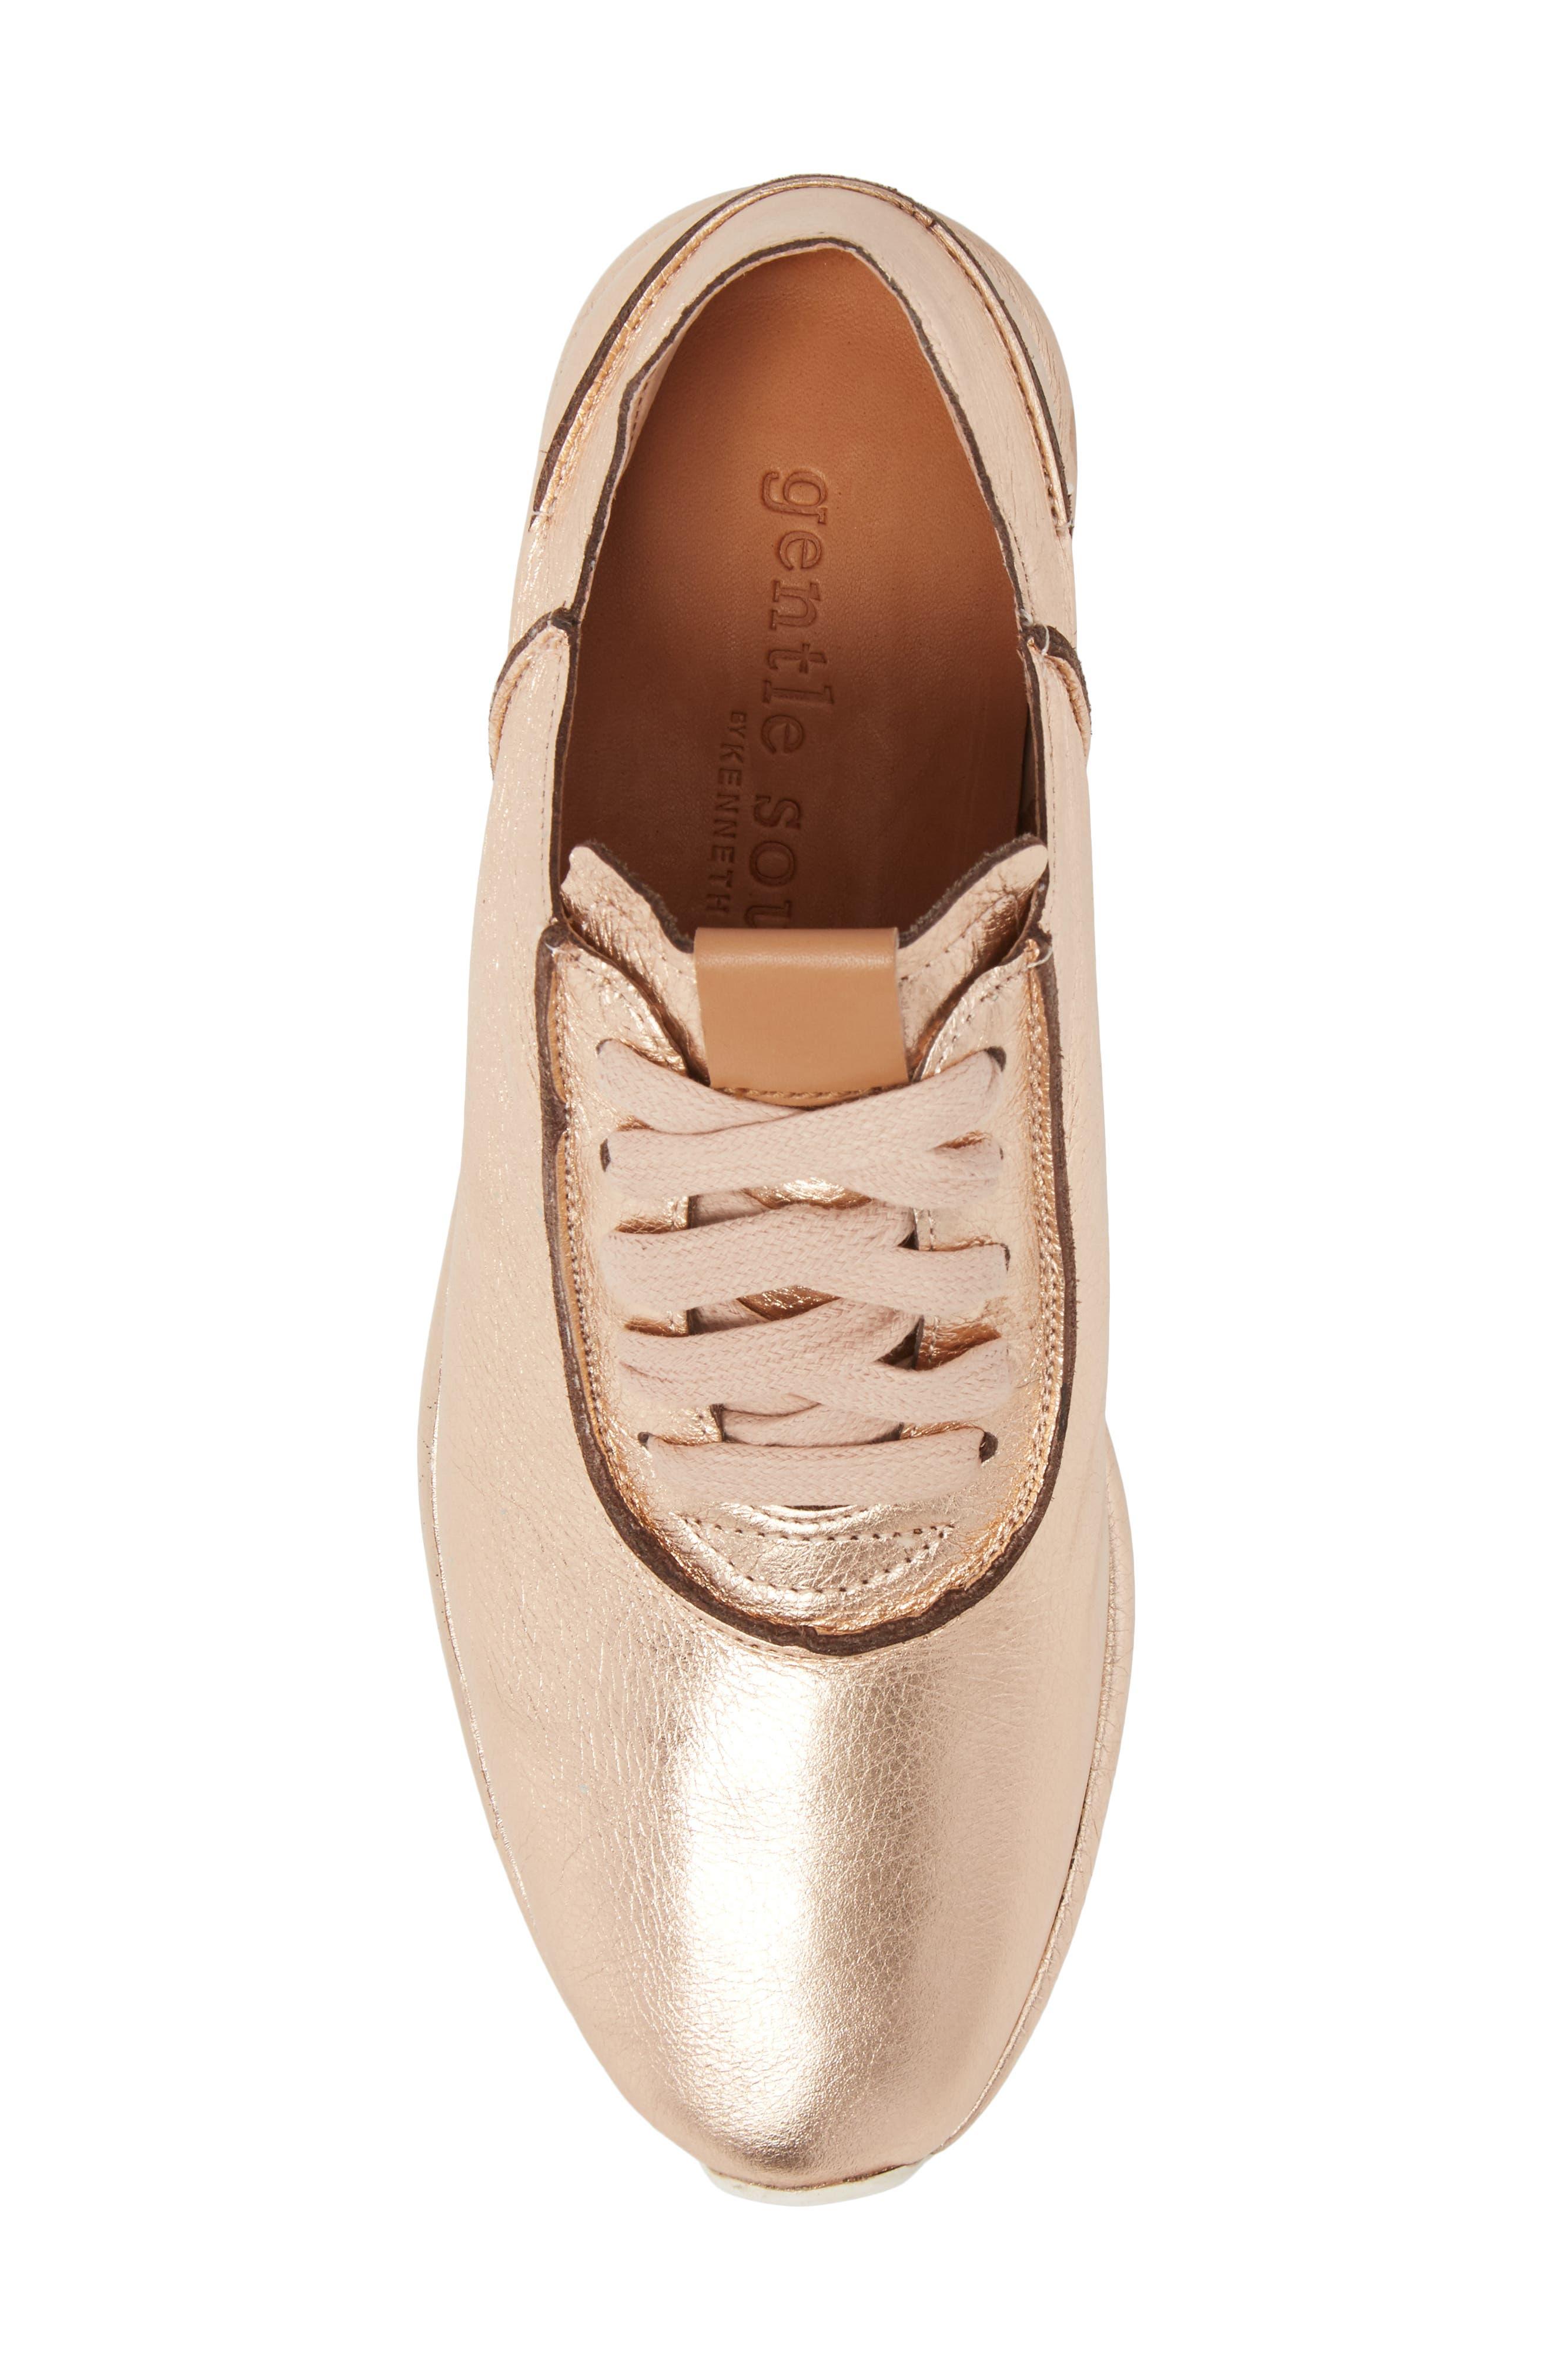 Raina Sneaker,                             Alternate thumbnail 5, color,                             ROSE GOLD METALLIC LEATHER